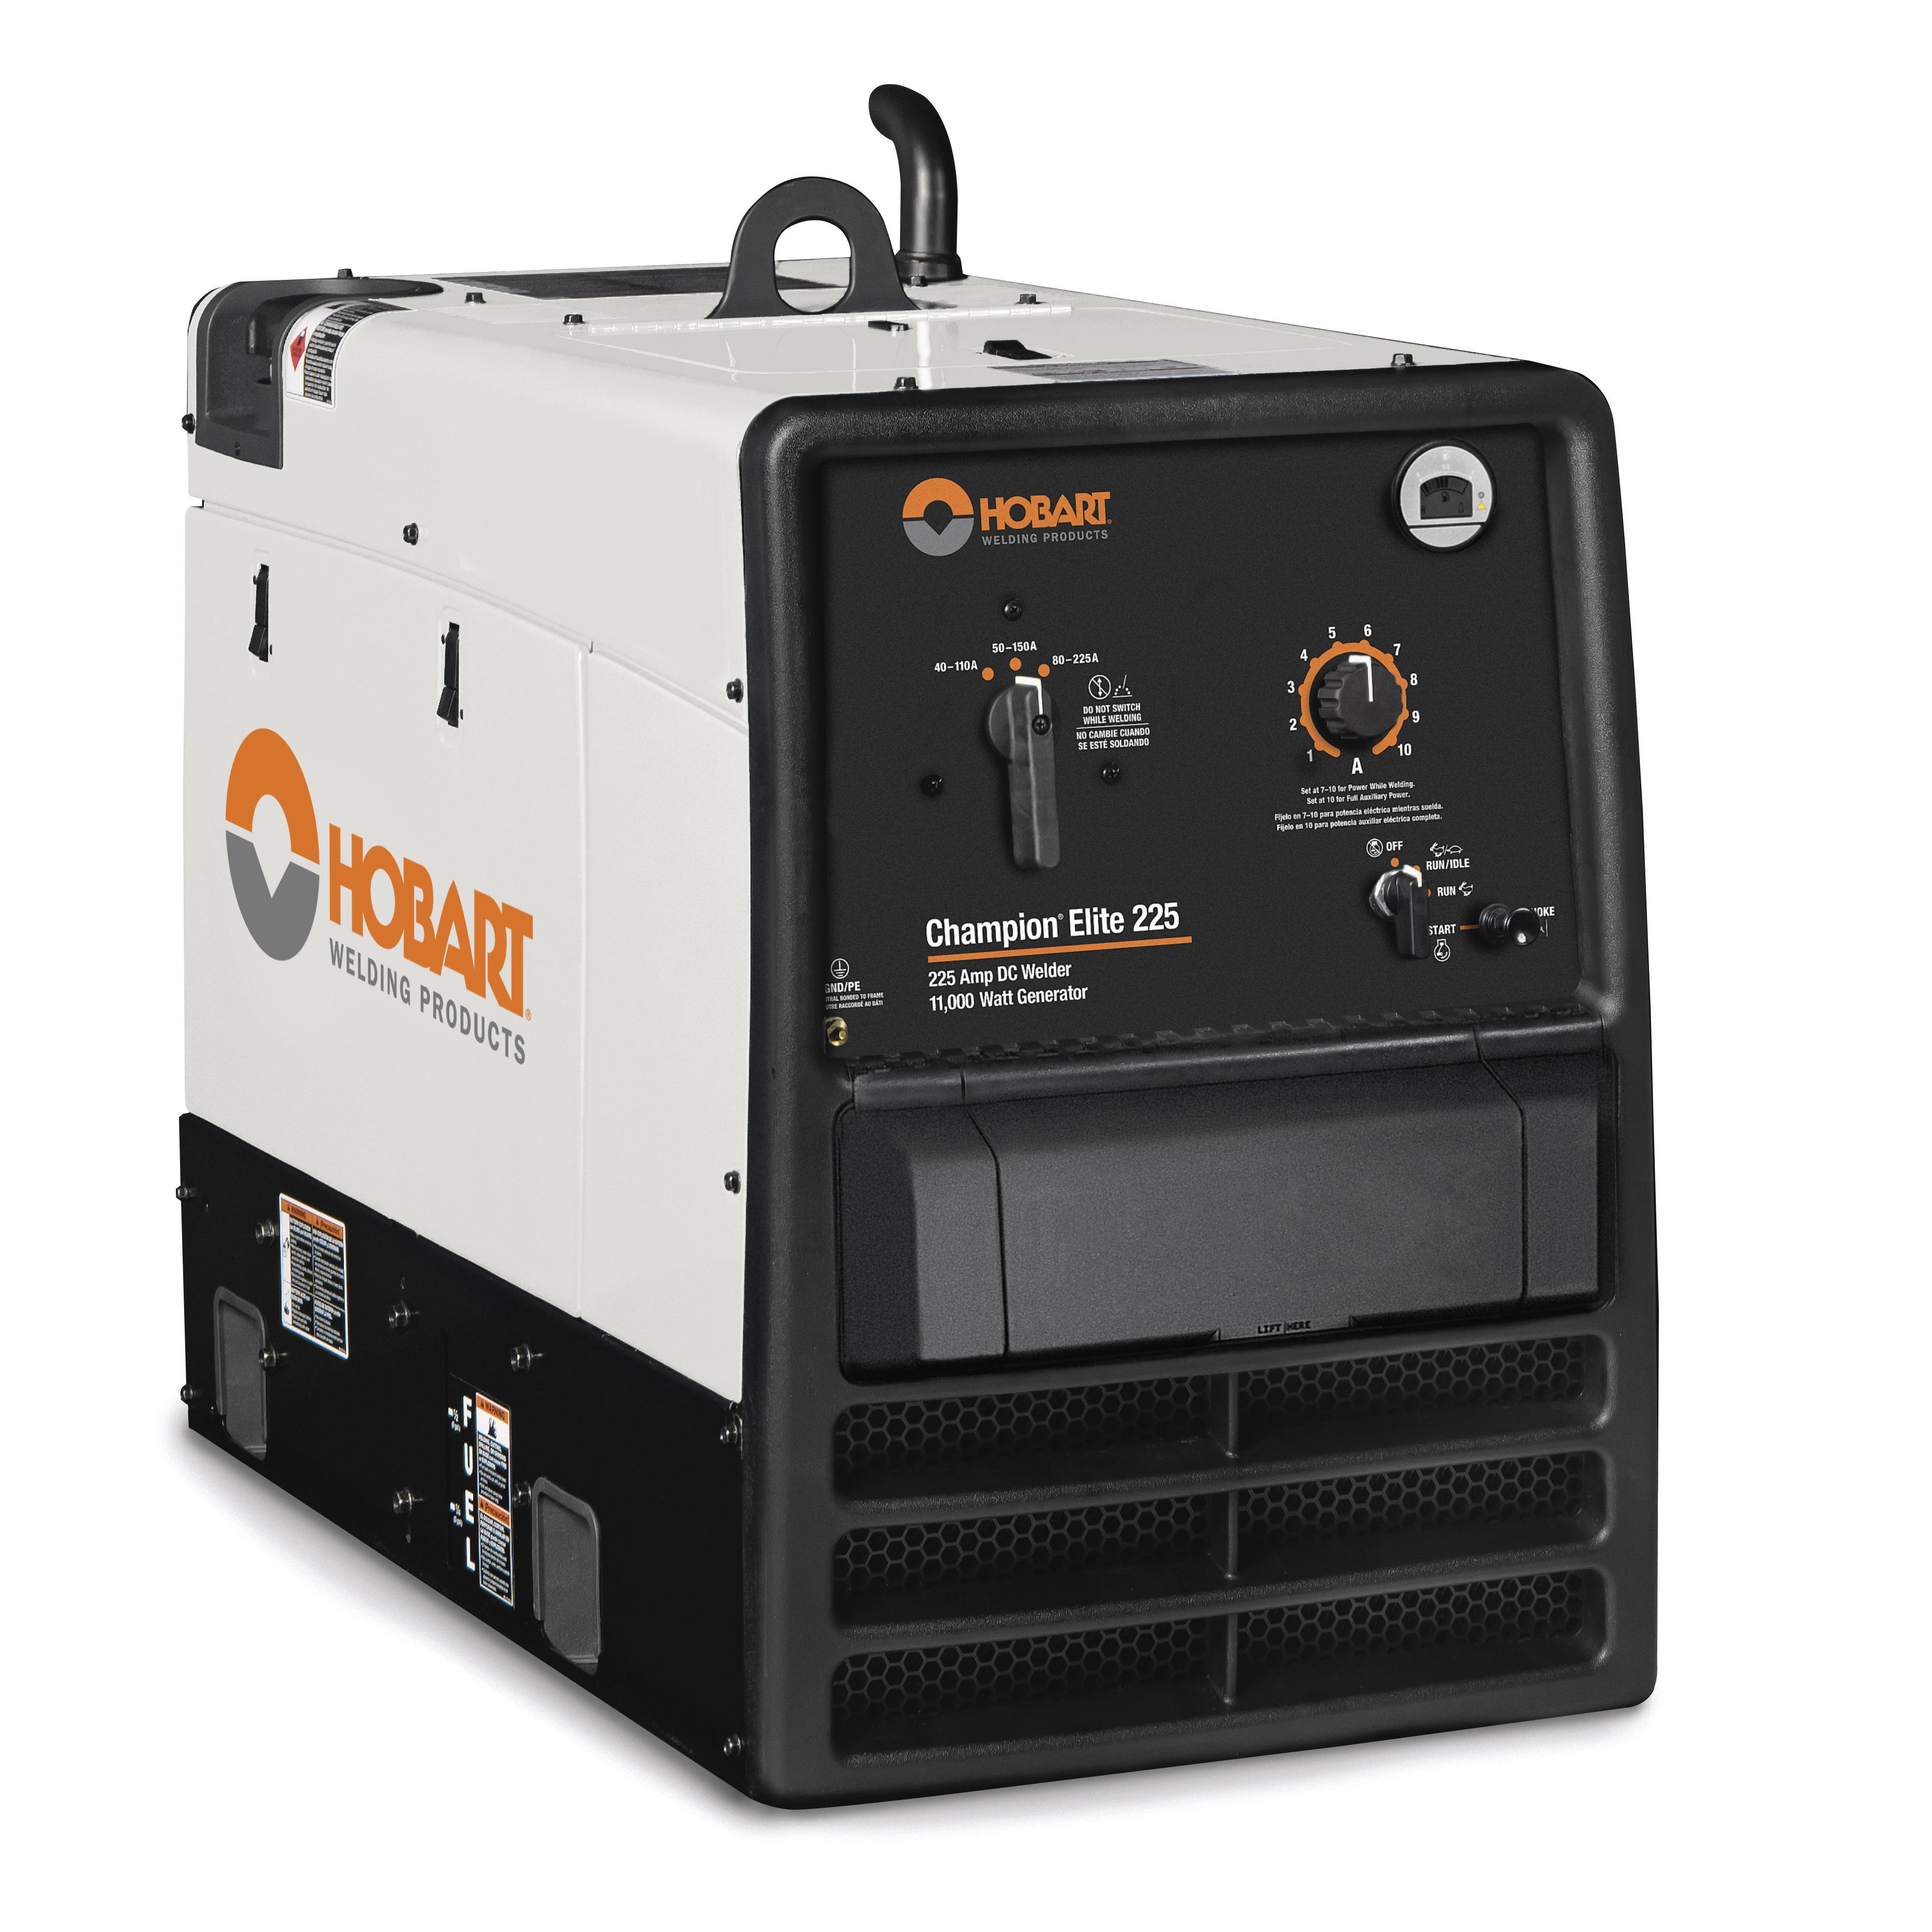 hobart champion elite dc stick smaw welder generator [ 1000 x 1000 Pixel ]